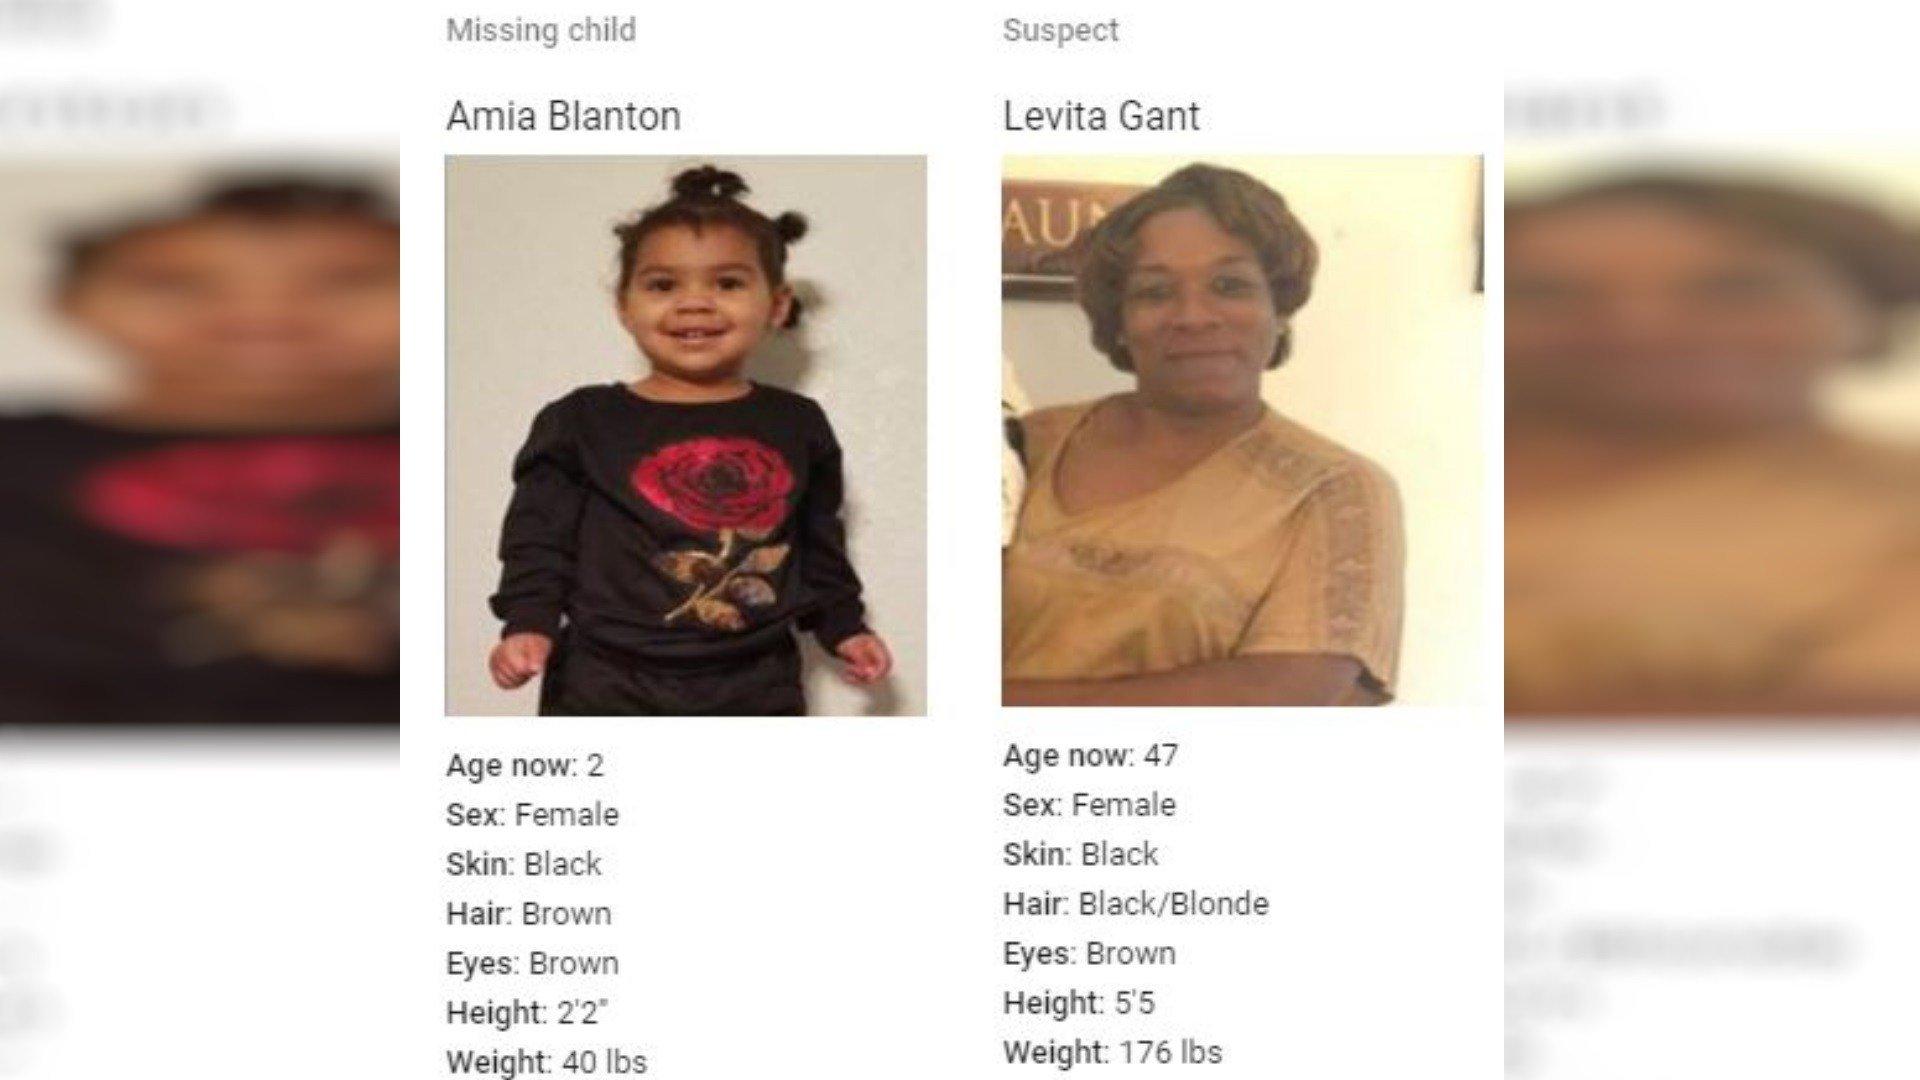 Photo: National Center for Missing and Exploited Children.